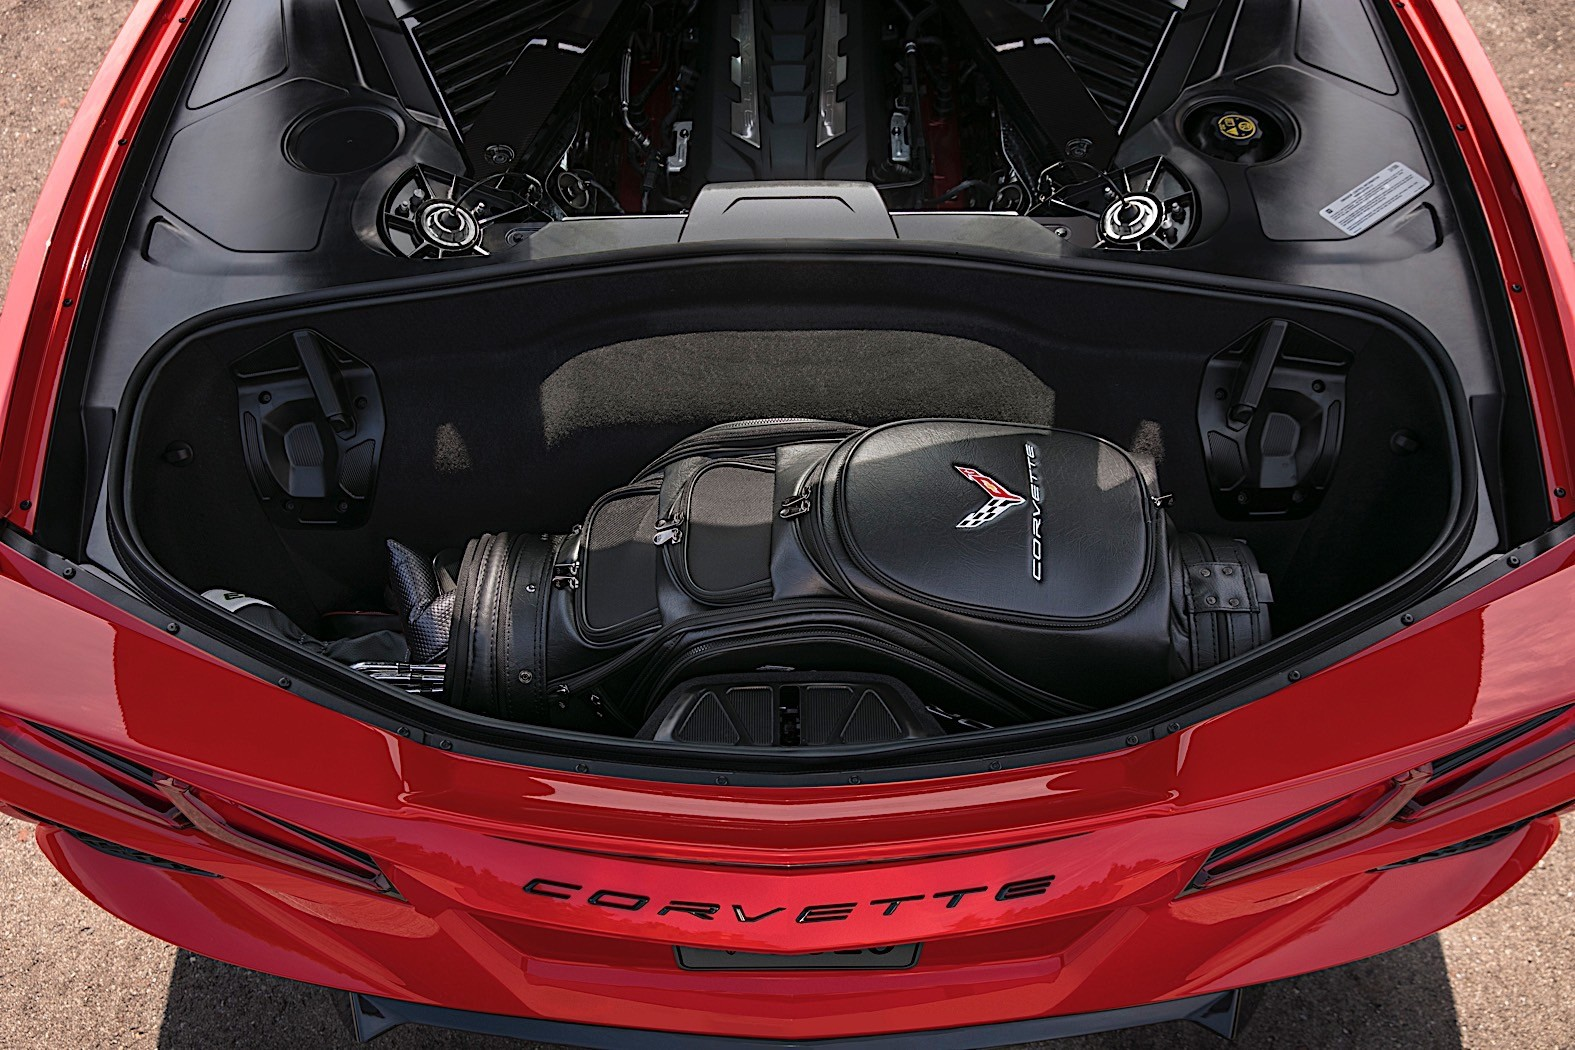 Corvette Top Speed 2020.2020 Chevrolet Corvette Stingray Top Speed Run Proves The C8 Can Hit